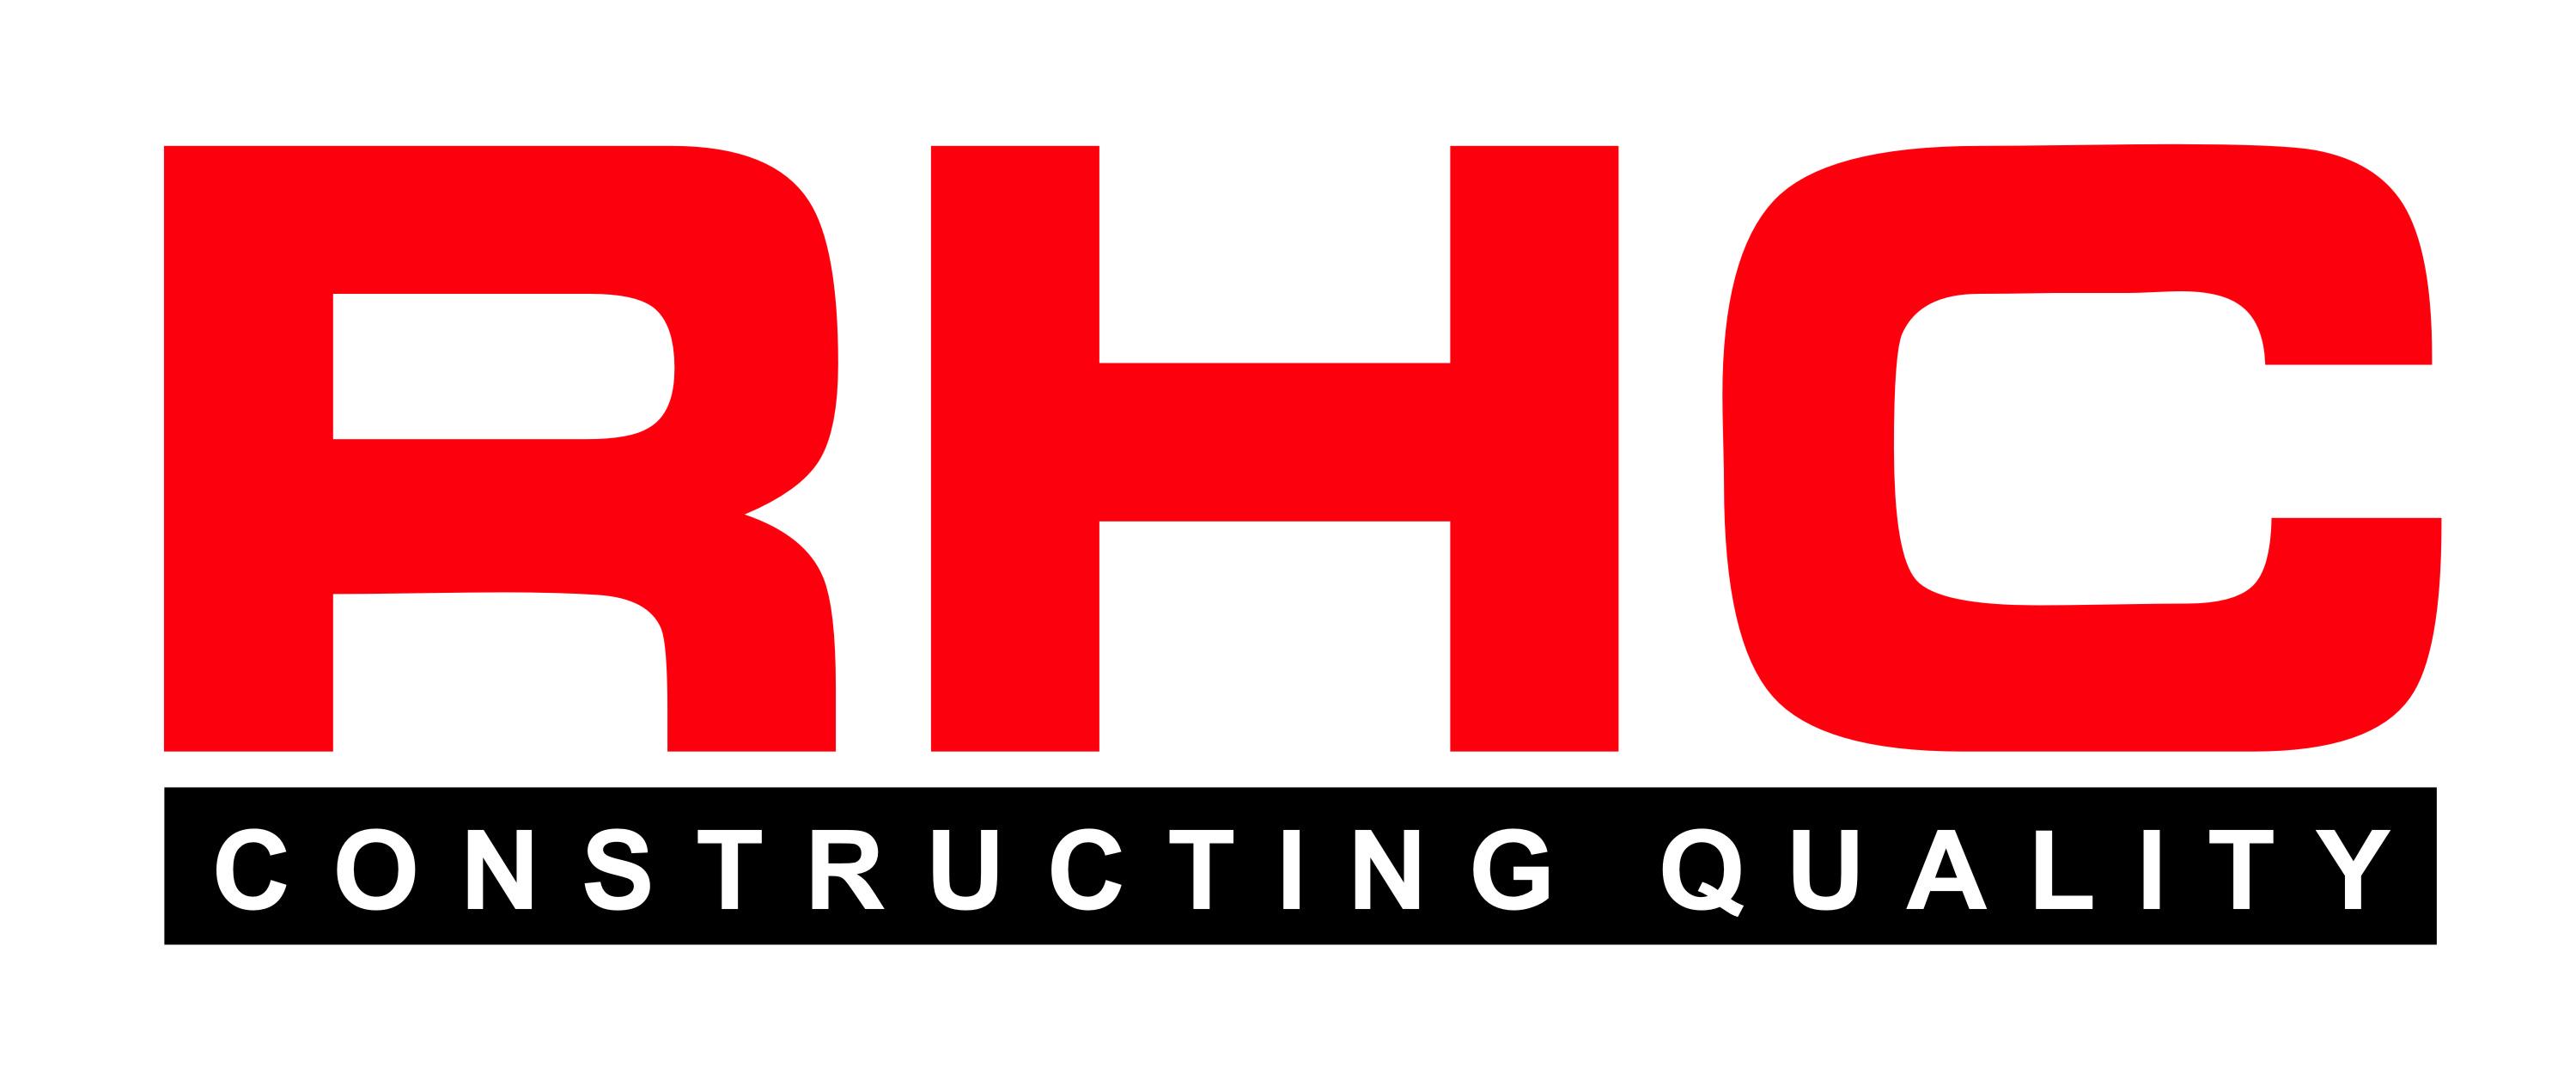 RHC Extending Solar Construction Services to Reduce Carbon Footprint